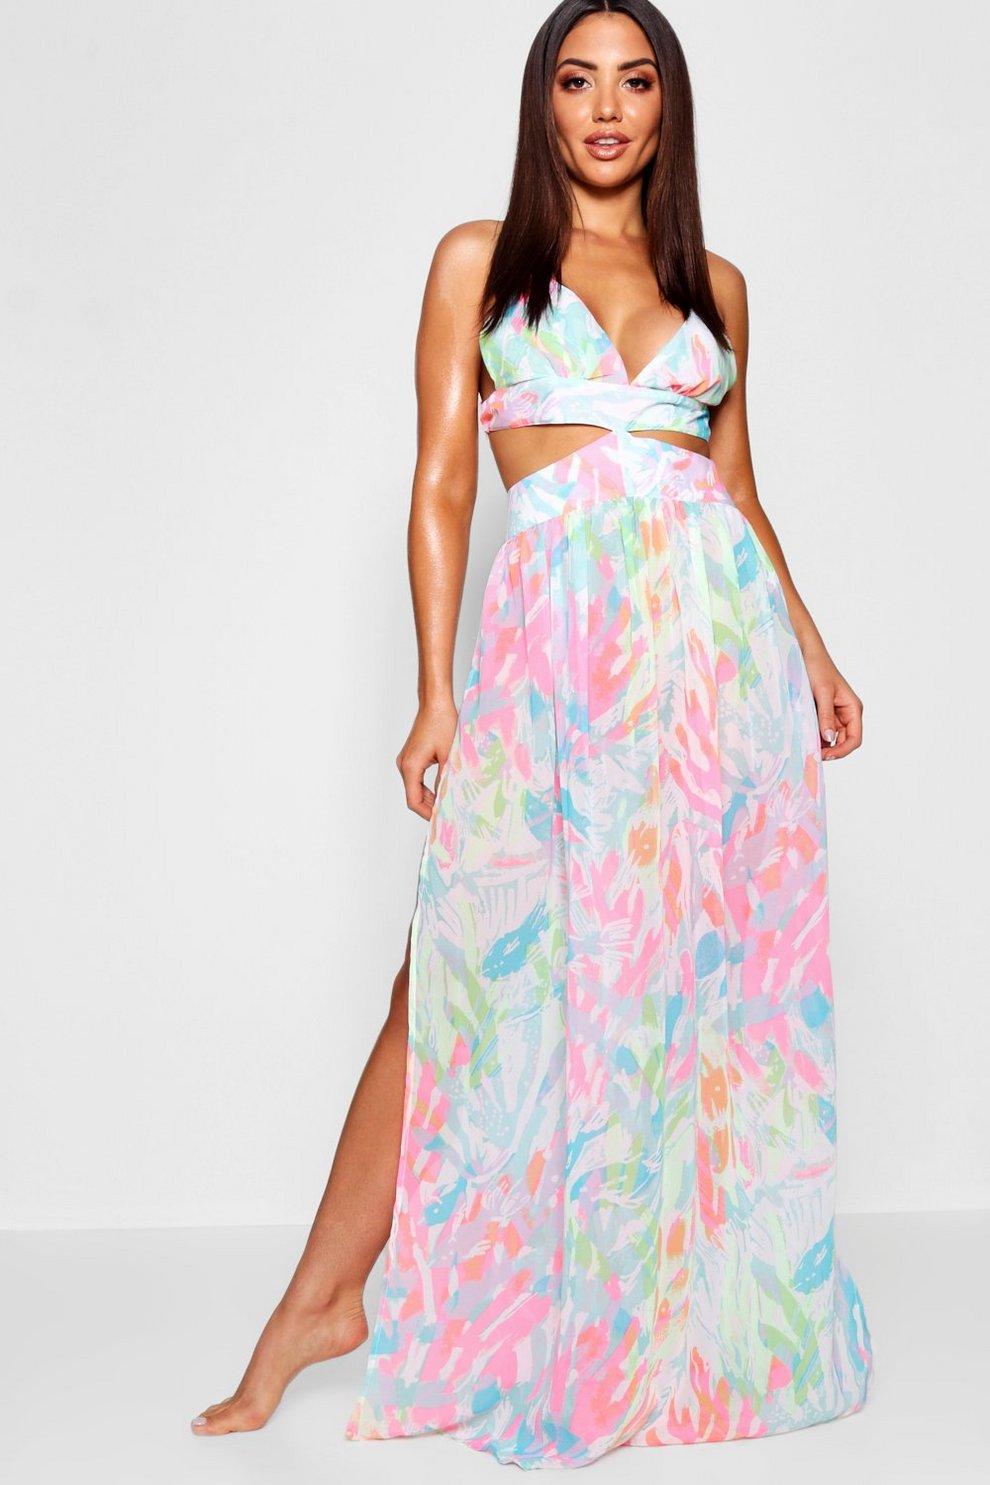 Neon Beach Dress